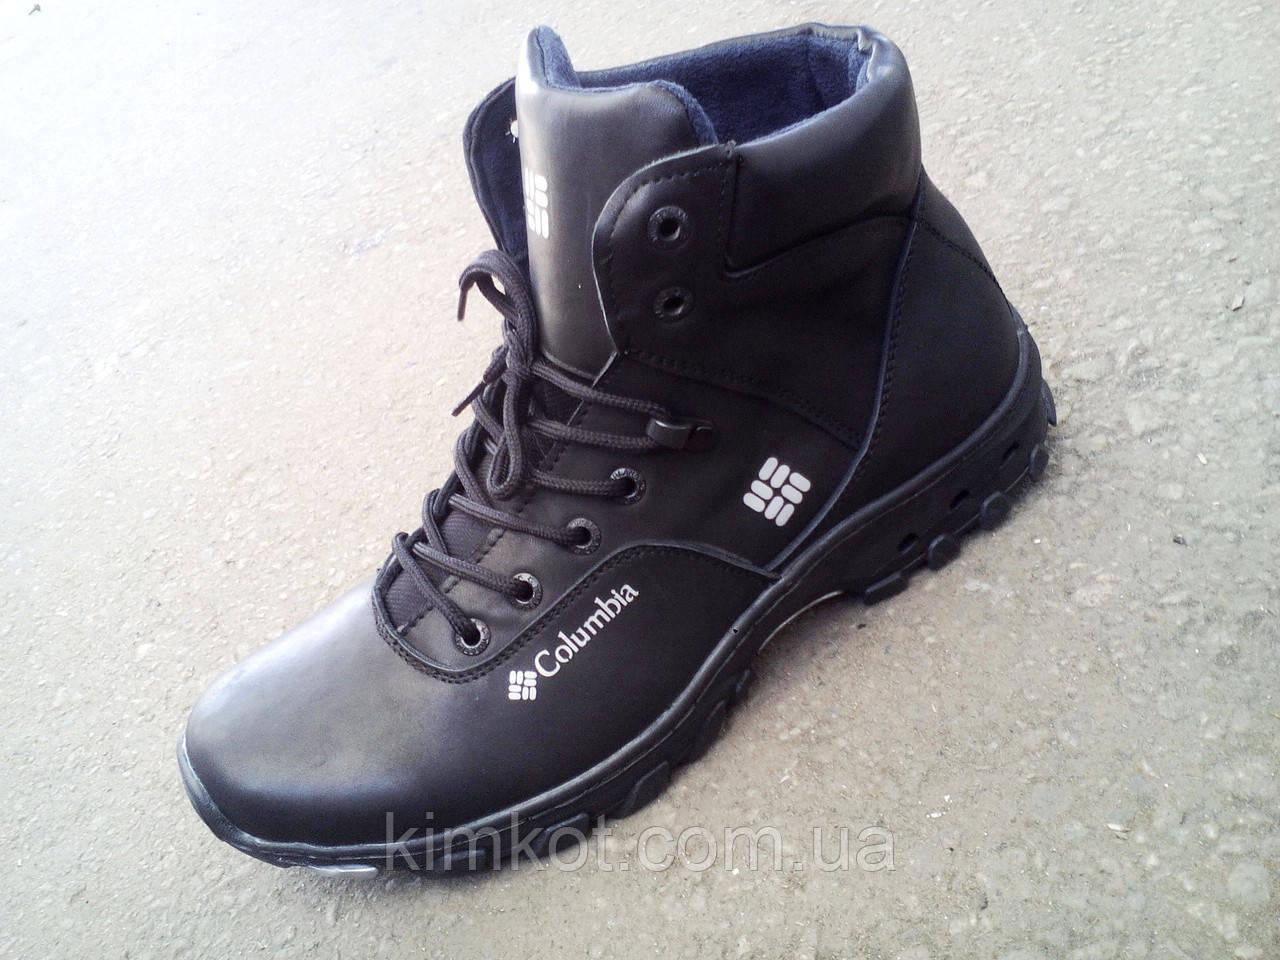 Мужские высокие зимние ботинки Columbia кожа 40-49 р-р - Интернет-Магазин c2648f07a4f